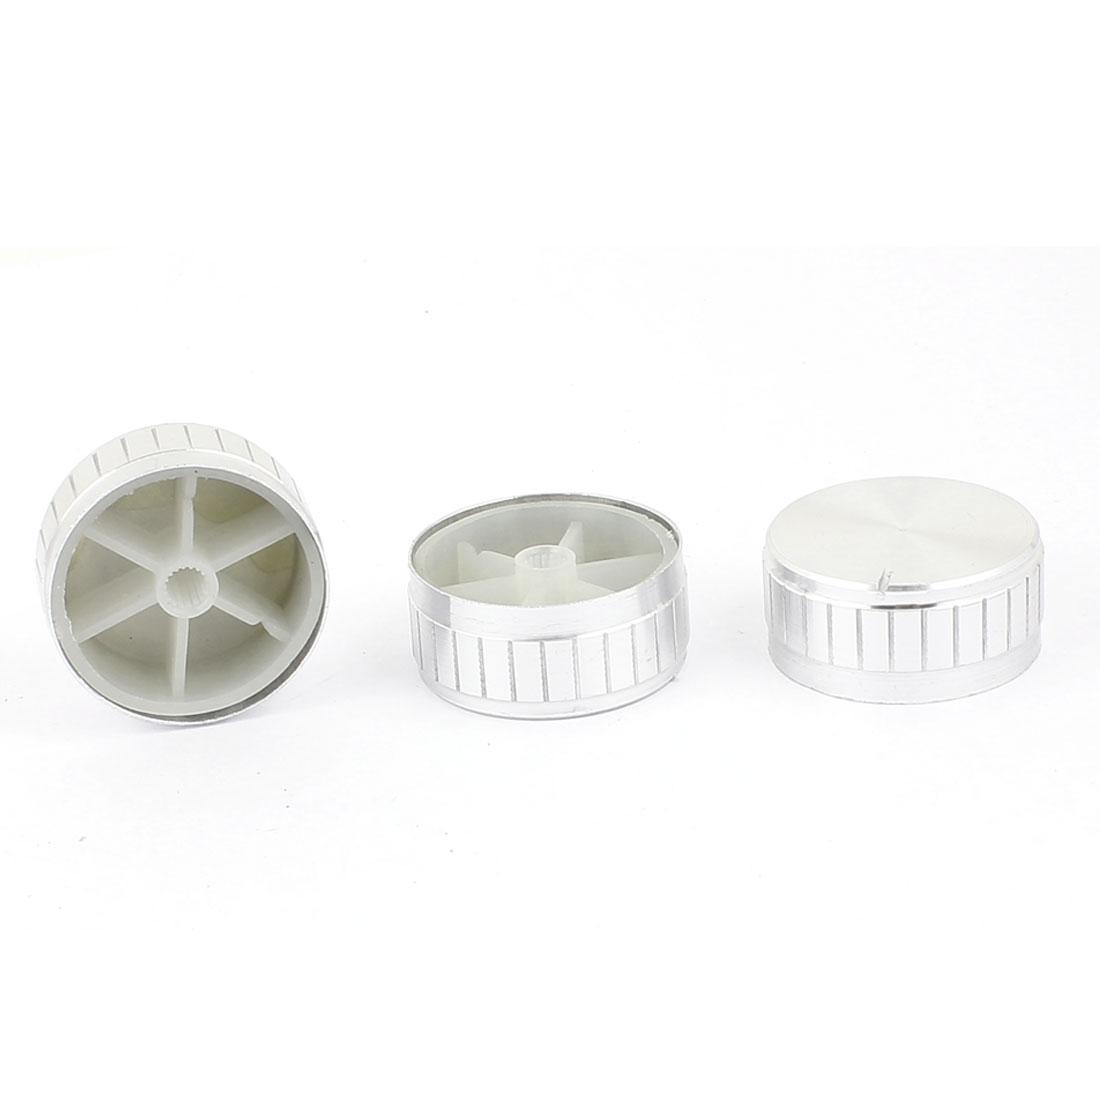 3pcs 40mm x 6mm Potentiometer Control Knob Volume Cap Knurled Button Silver Tone